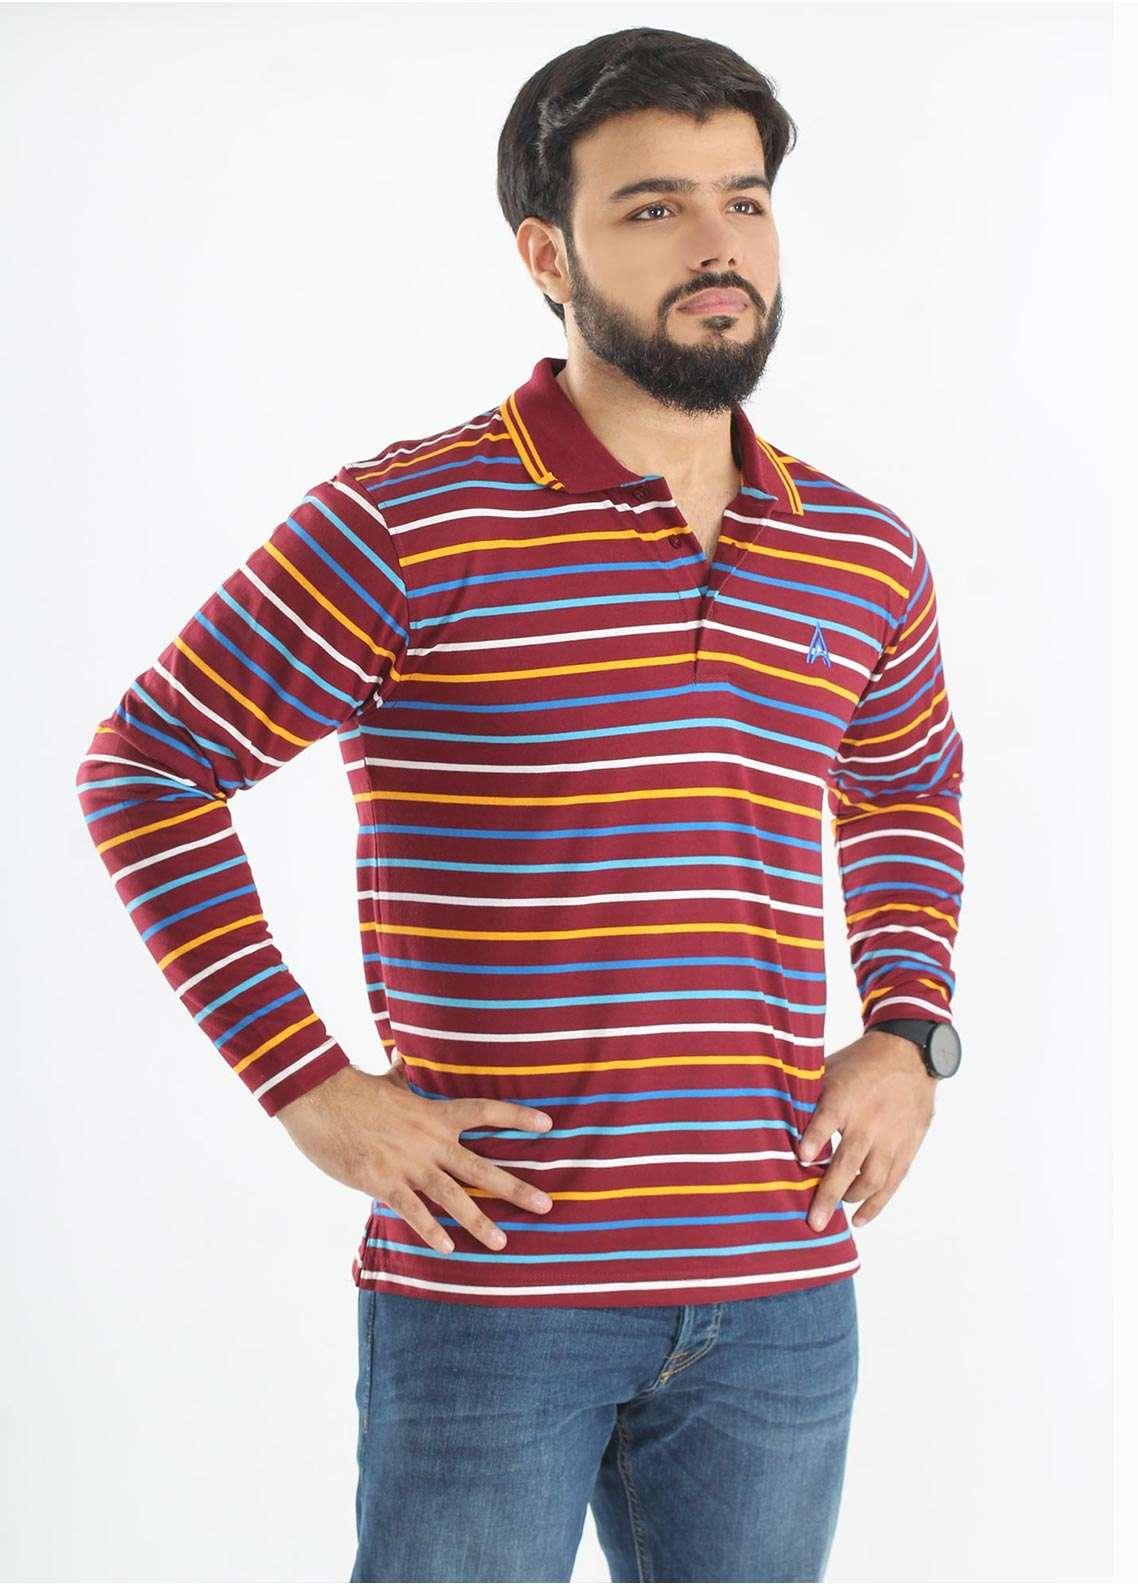 Anchor Jersey Polo Men T-Shirts - Multi A-232